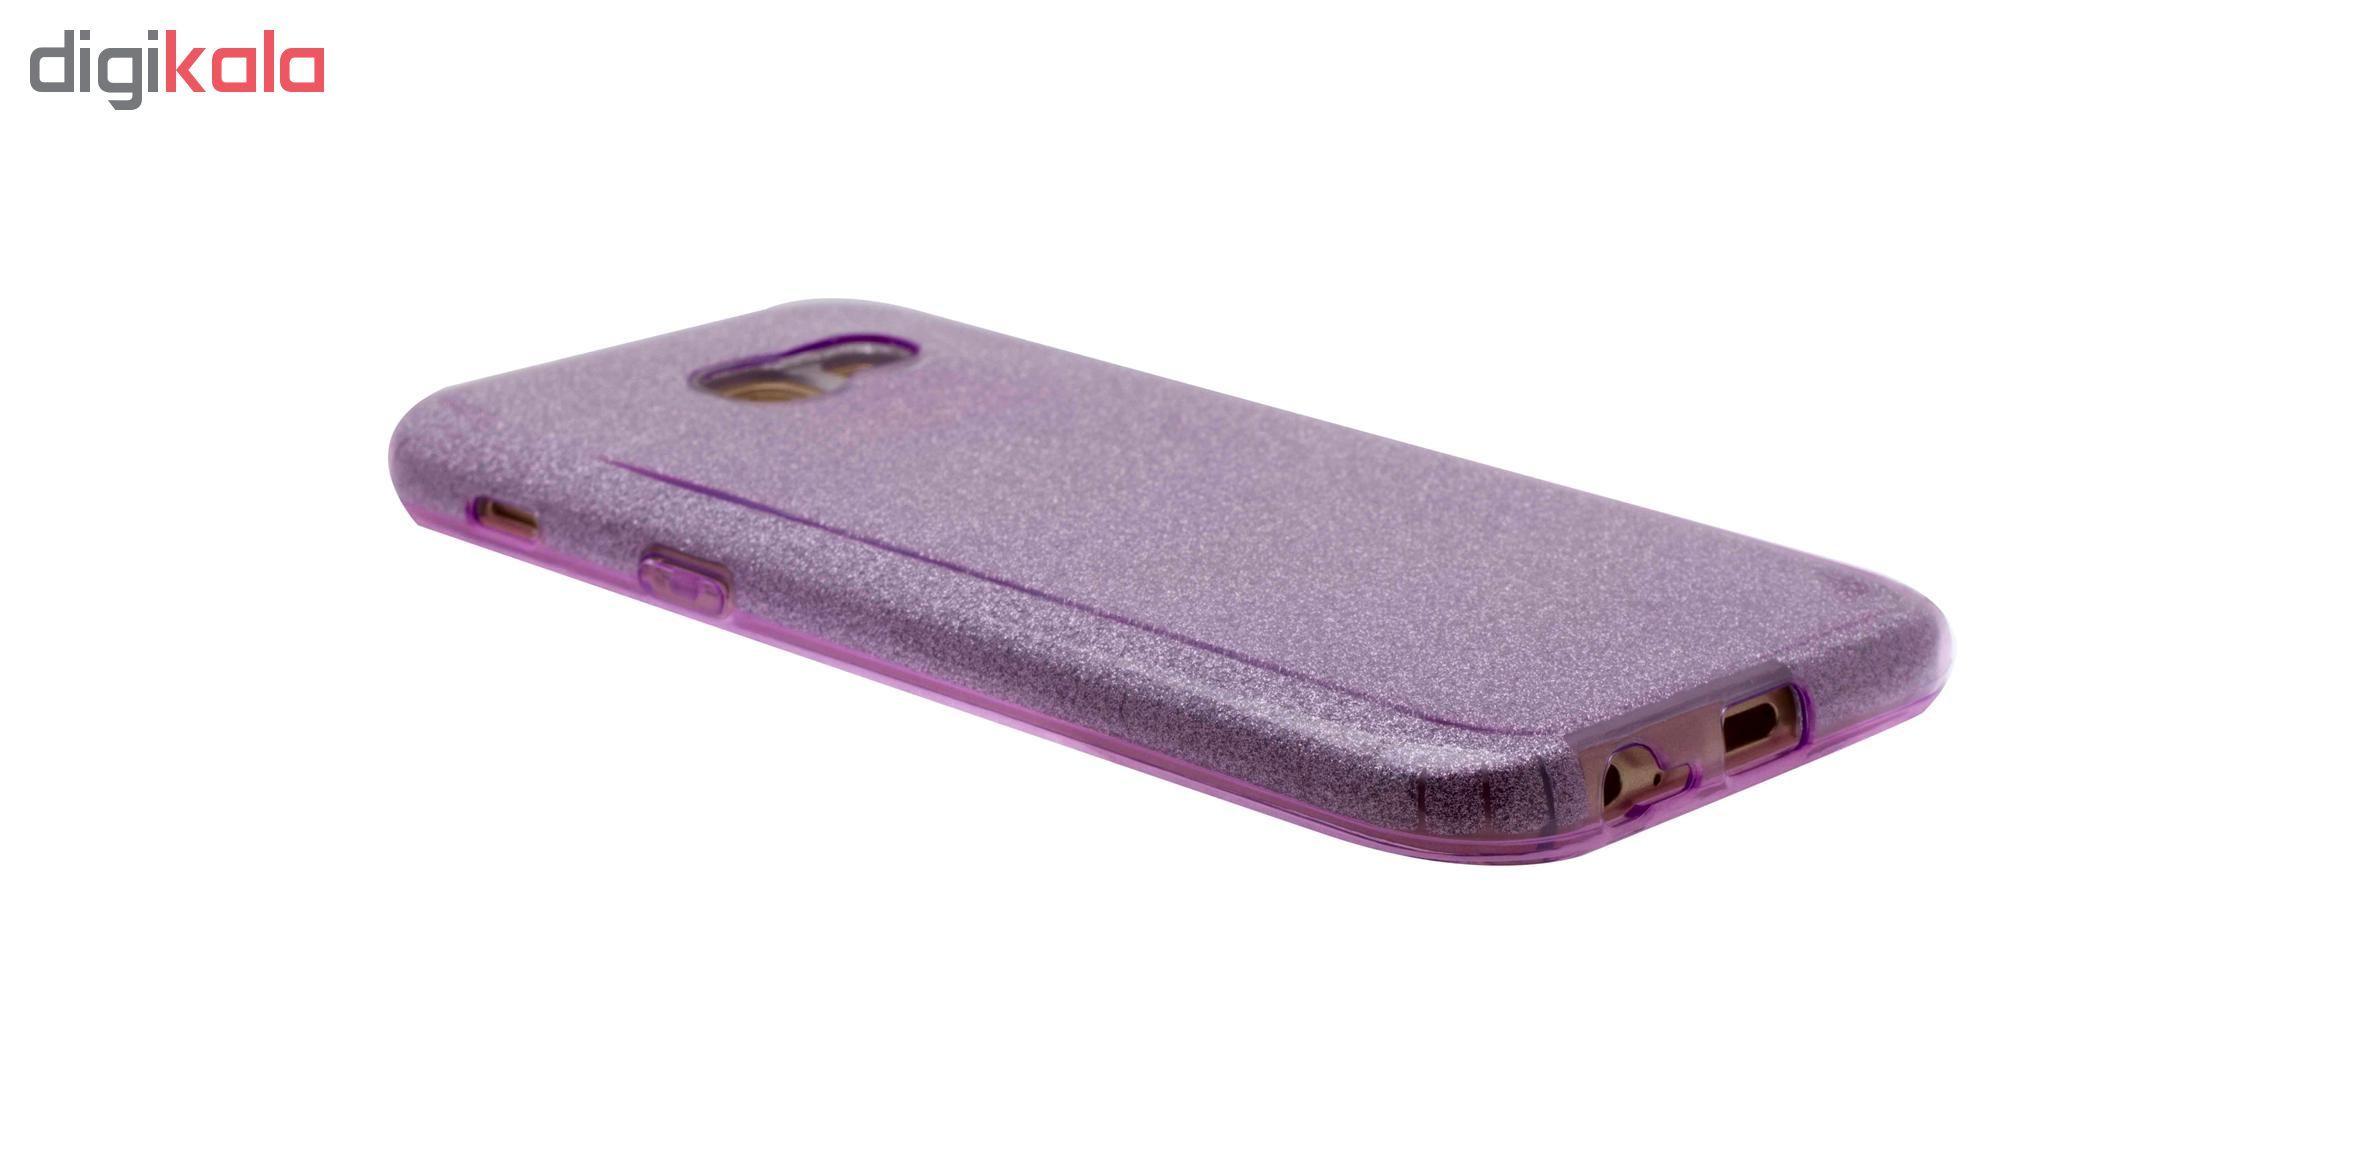 کاور مدل CORONA طرح اکلیلی مناسب برای گوشی سامسونگ گلکسی A5 2017 / A520 main 1 11